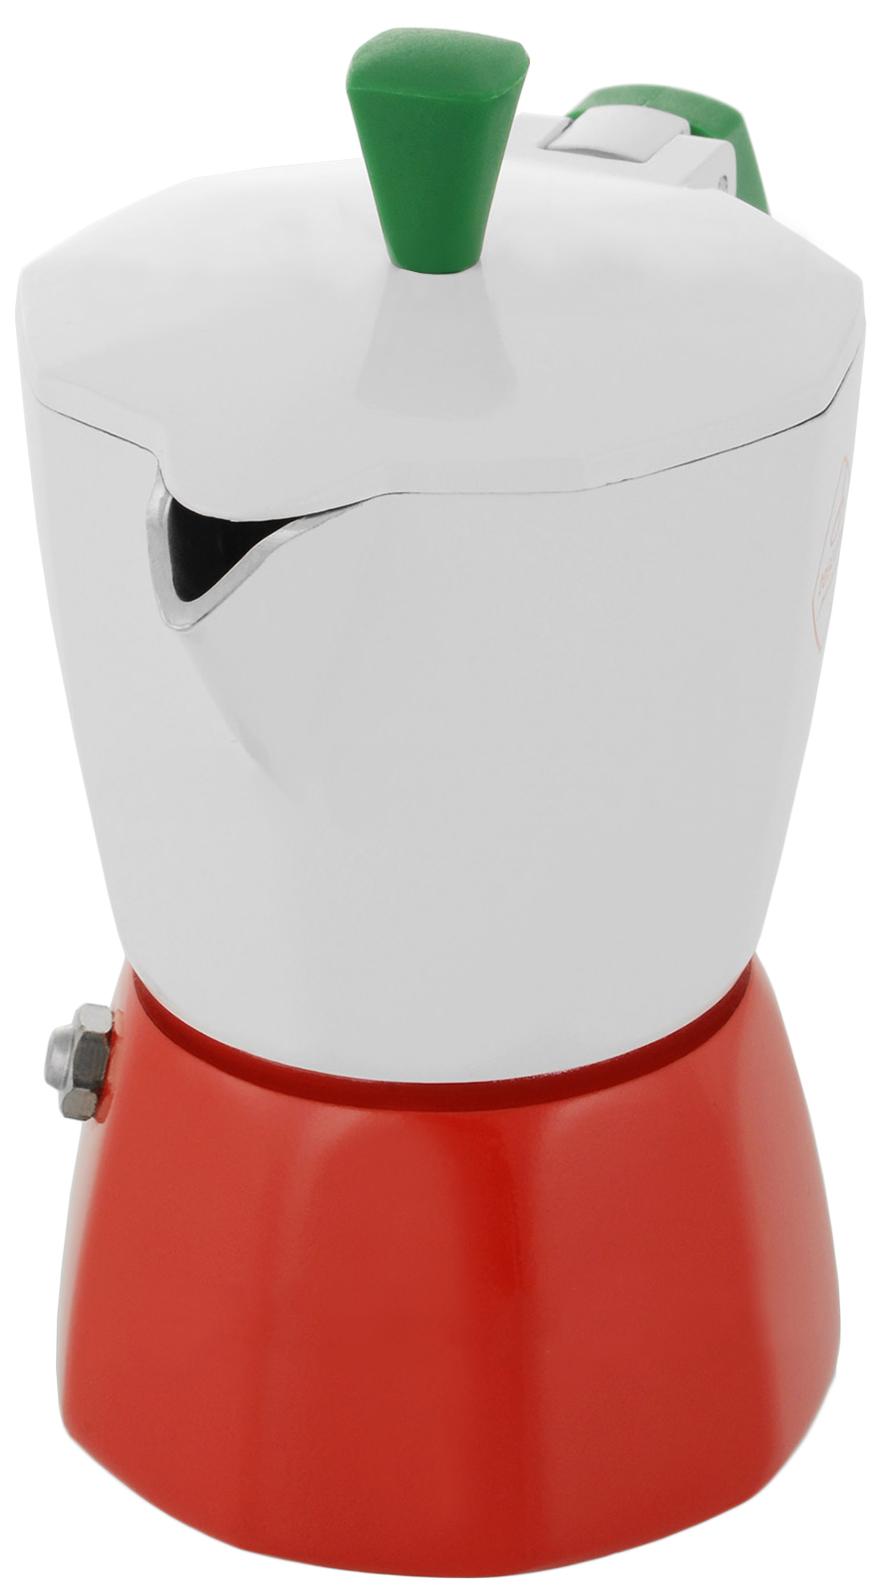 Кофеварка гейзерная tescoma PALOMA Tricolore